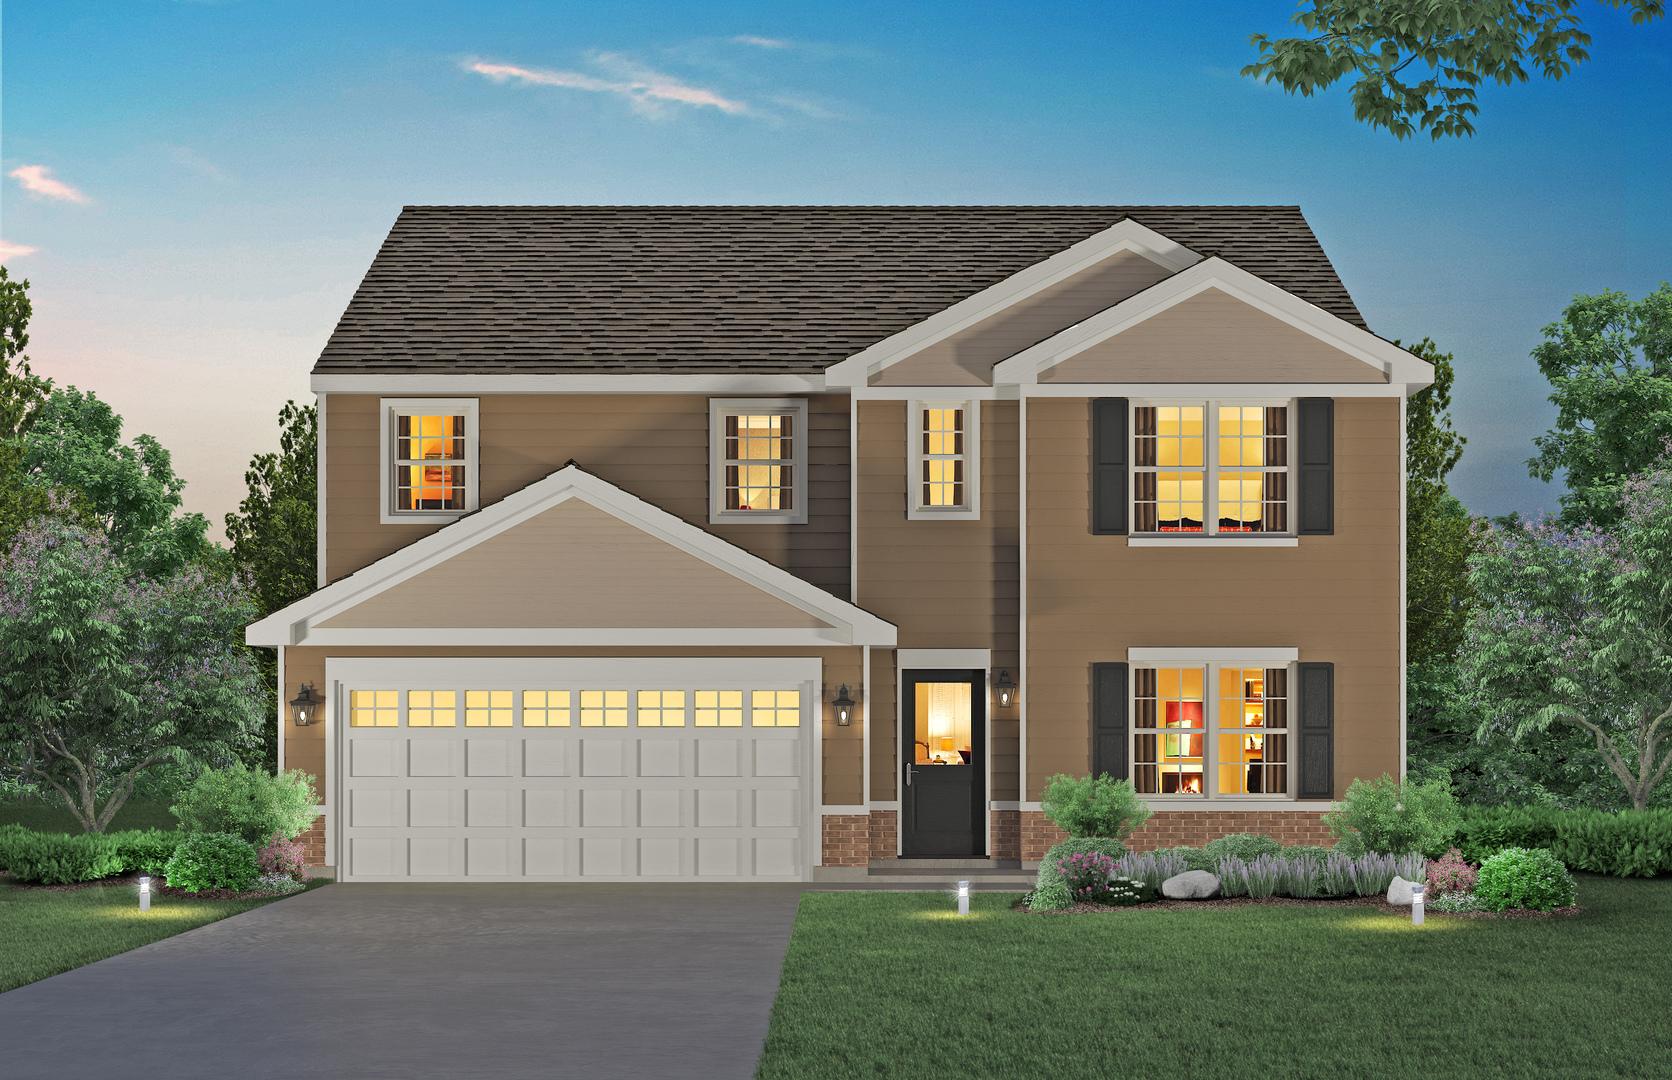 34190 North Jenna Lane, Gurnee, Illinois 60031